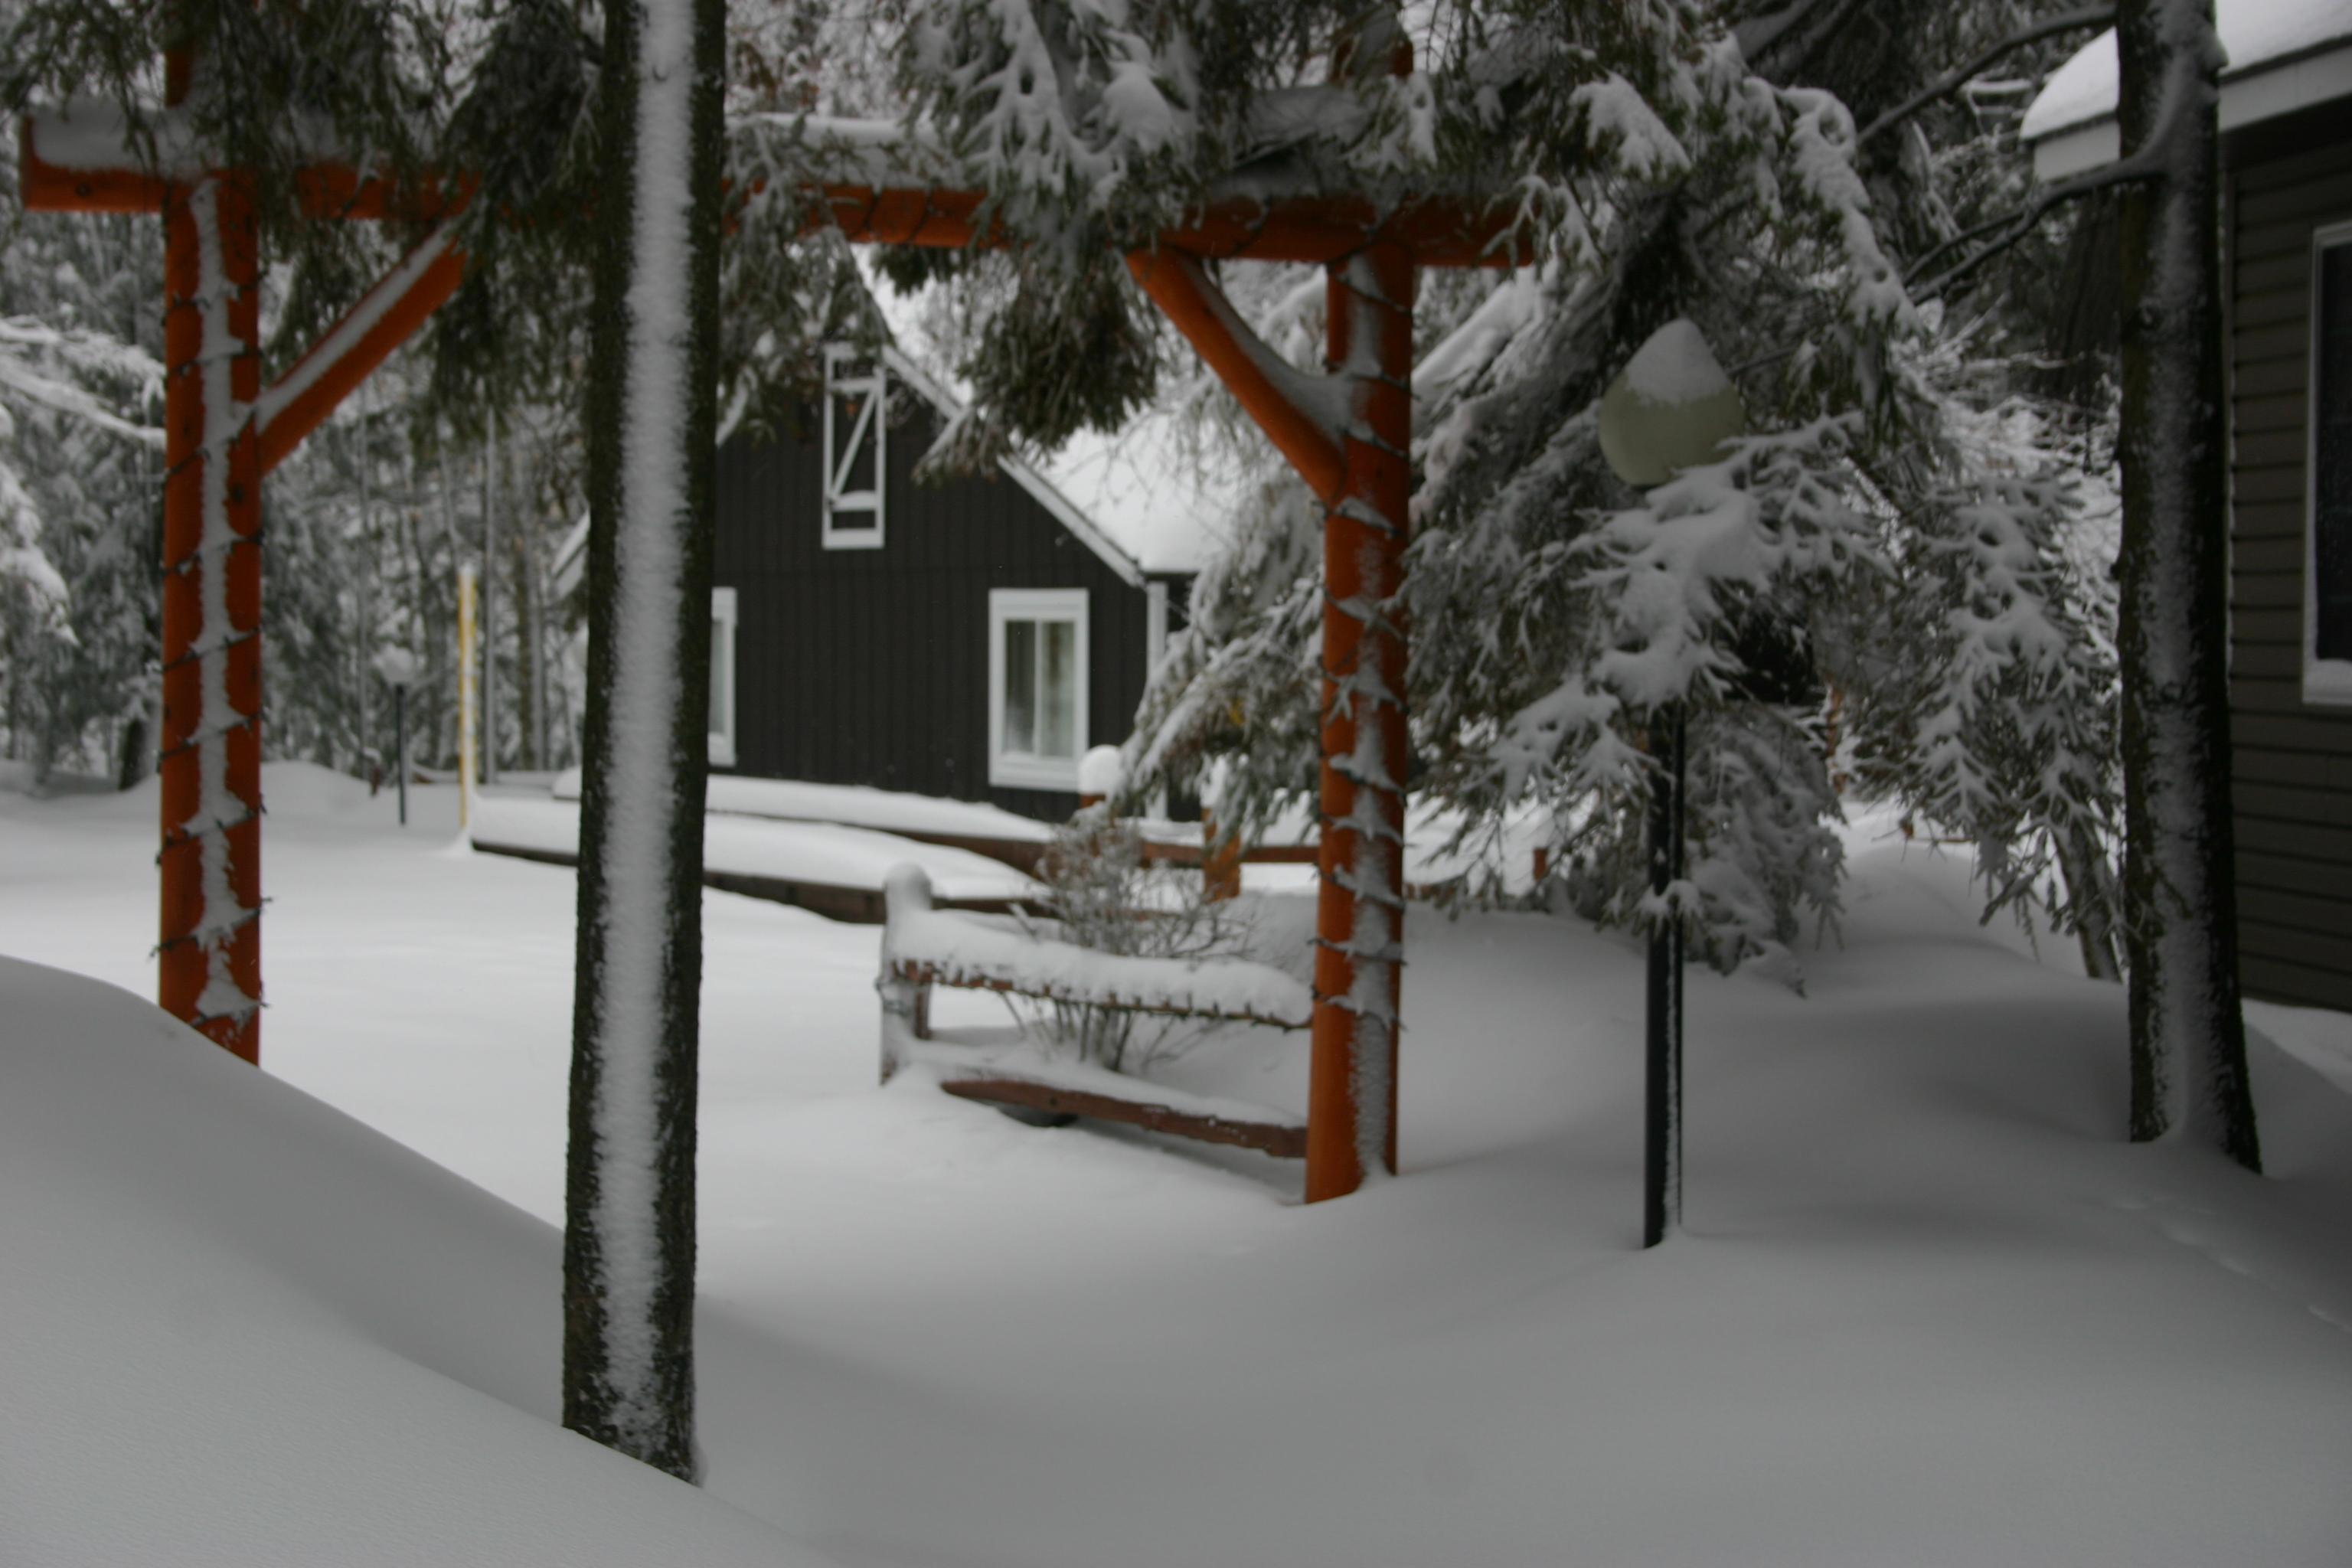 Winter Wonderland once again.